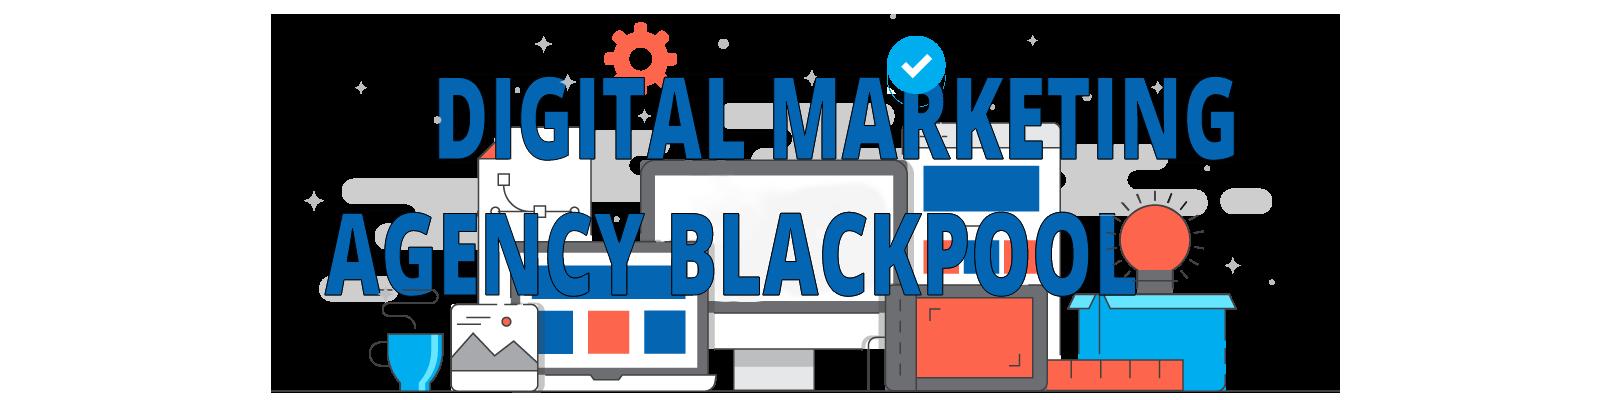 digital marketing agency blackpool-grow your business online